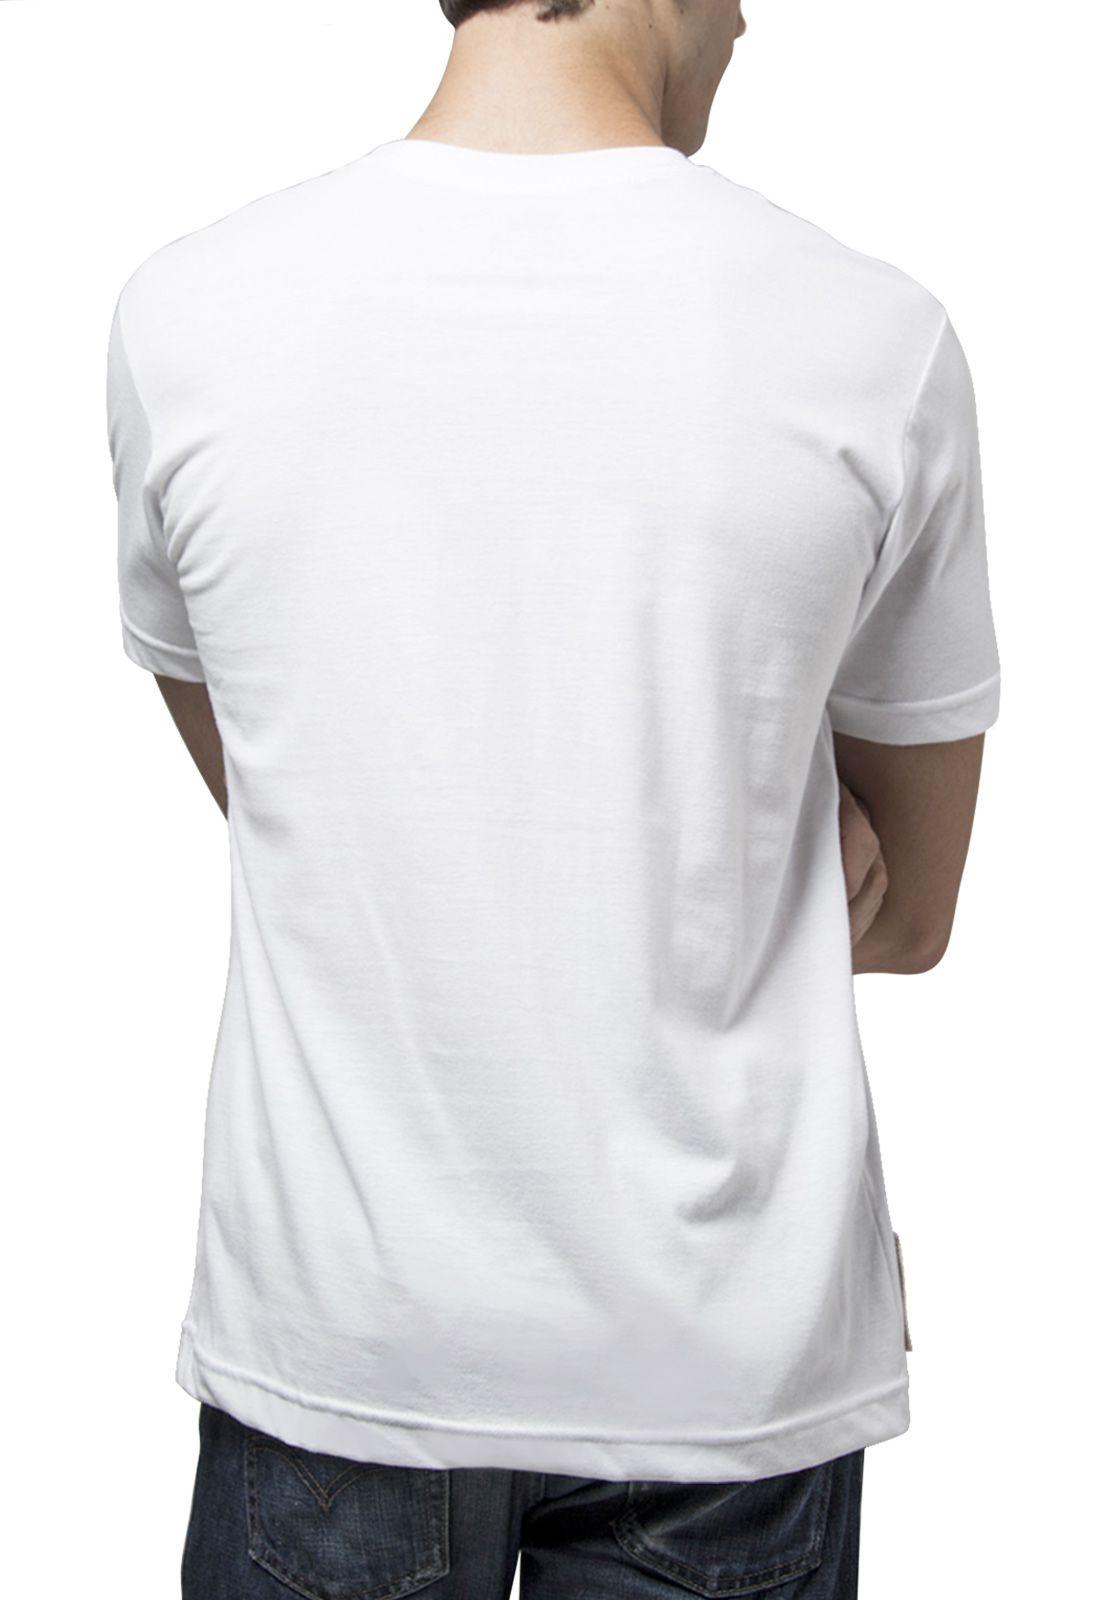 Camiseta Amazônia SOS Arara - Branco